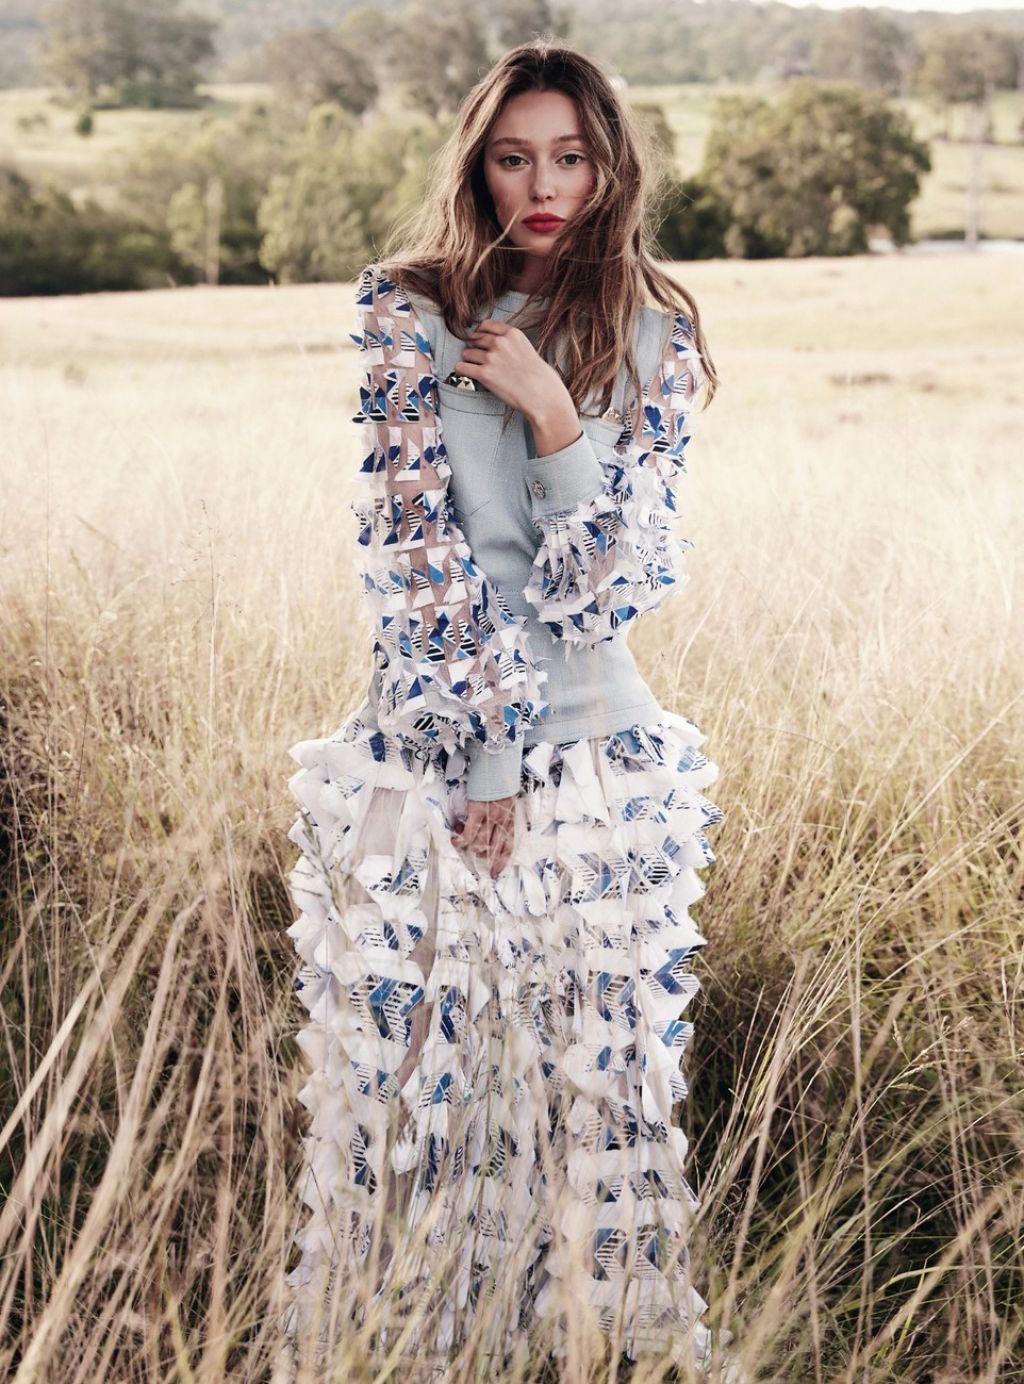 Photoshoot For Vogue Magazine November 2015: Photoshoot For Vogue Australia June 2016